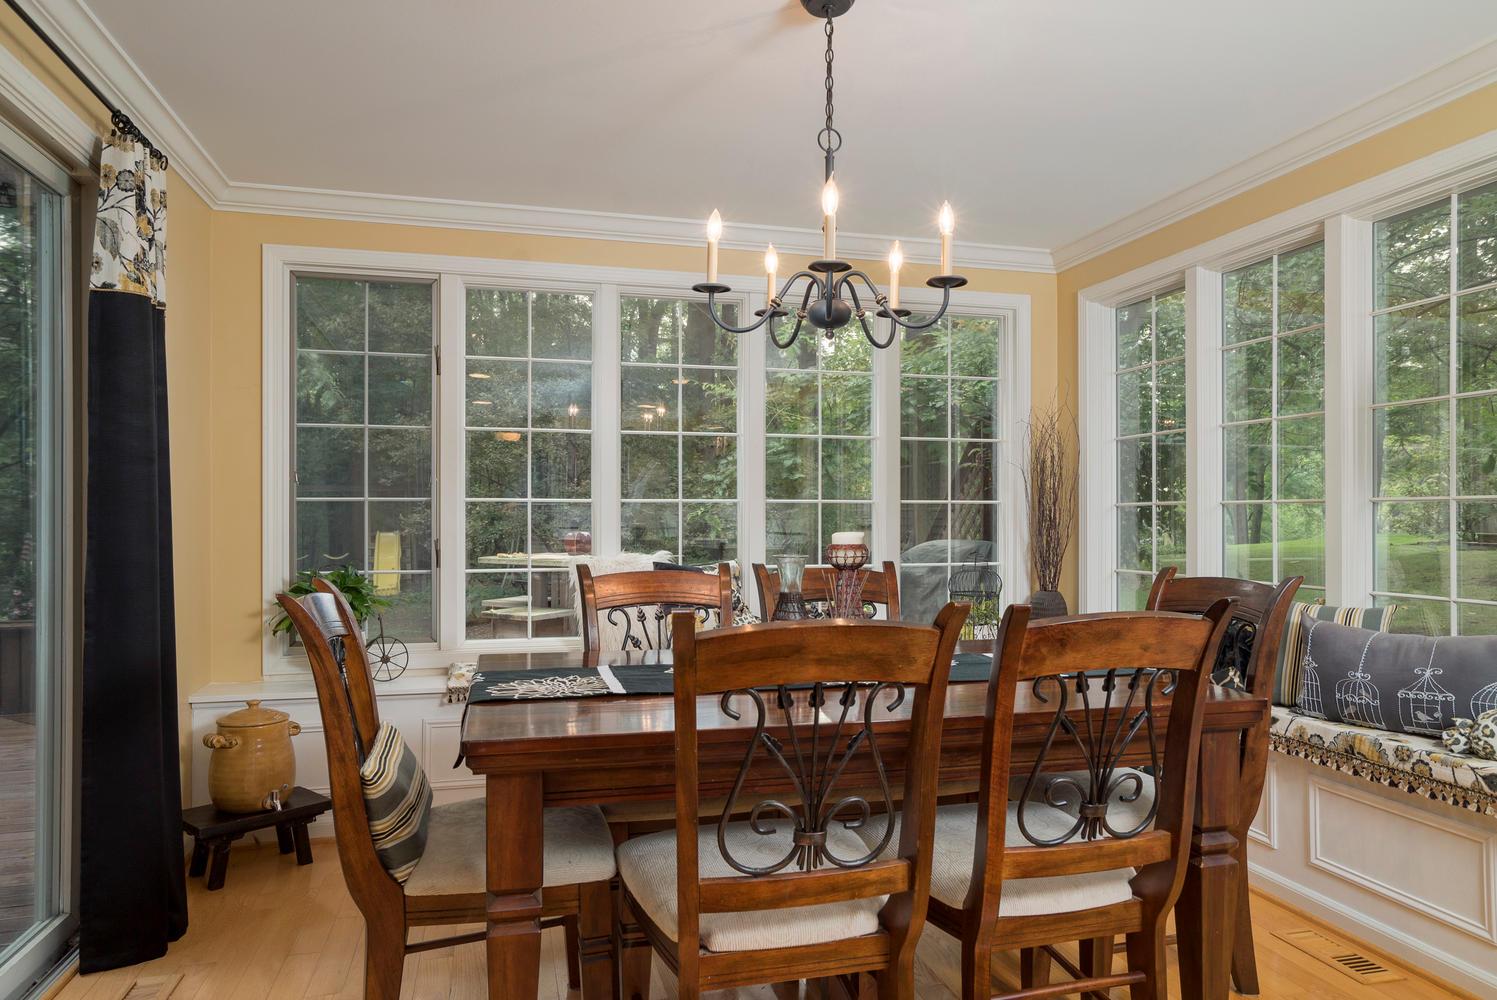 36 Timberlake Dr Orchard Park-large-012-18-Morning Room-1498x1000-72dpi